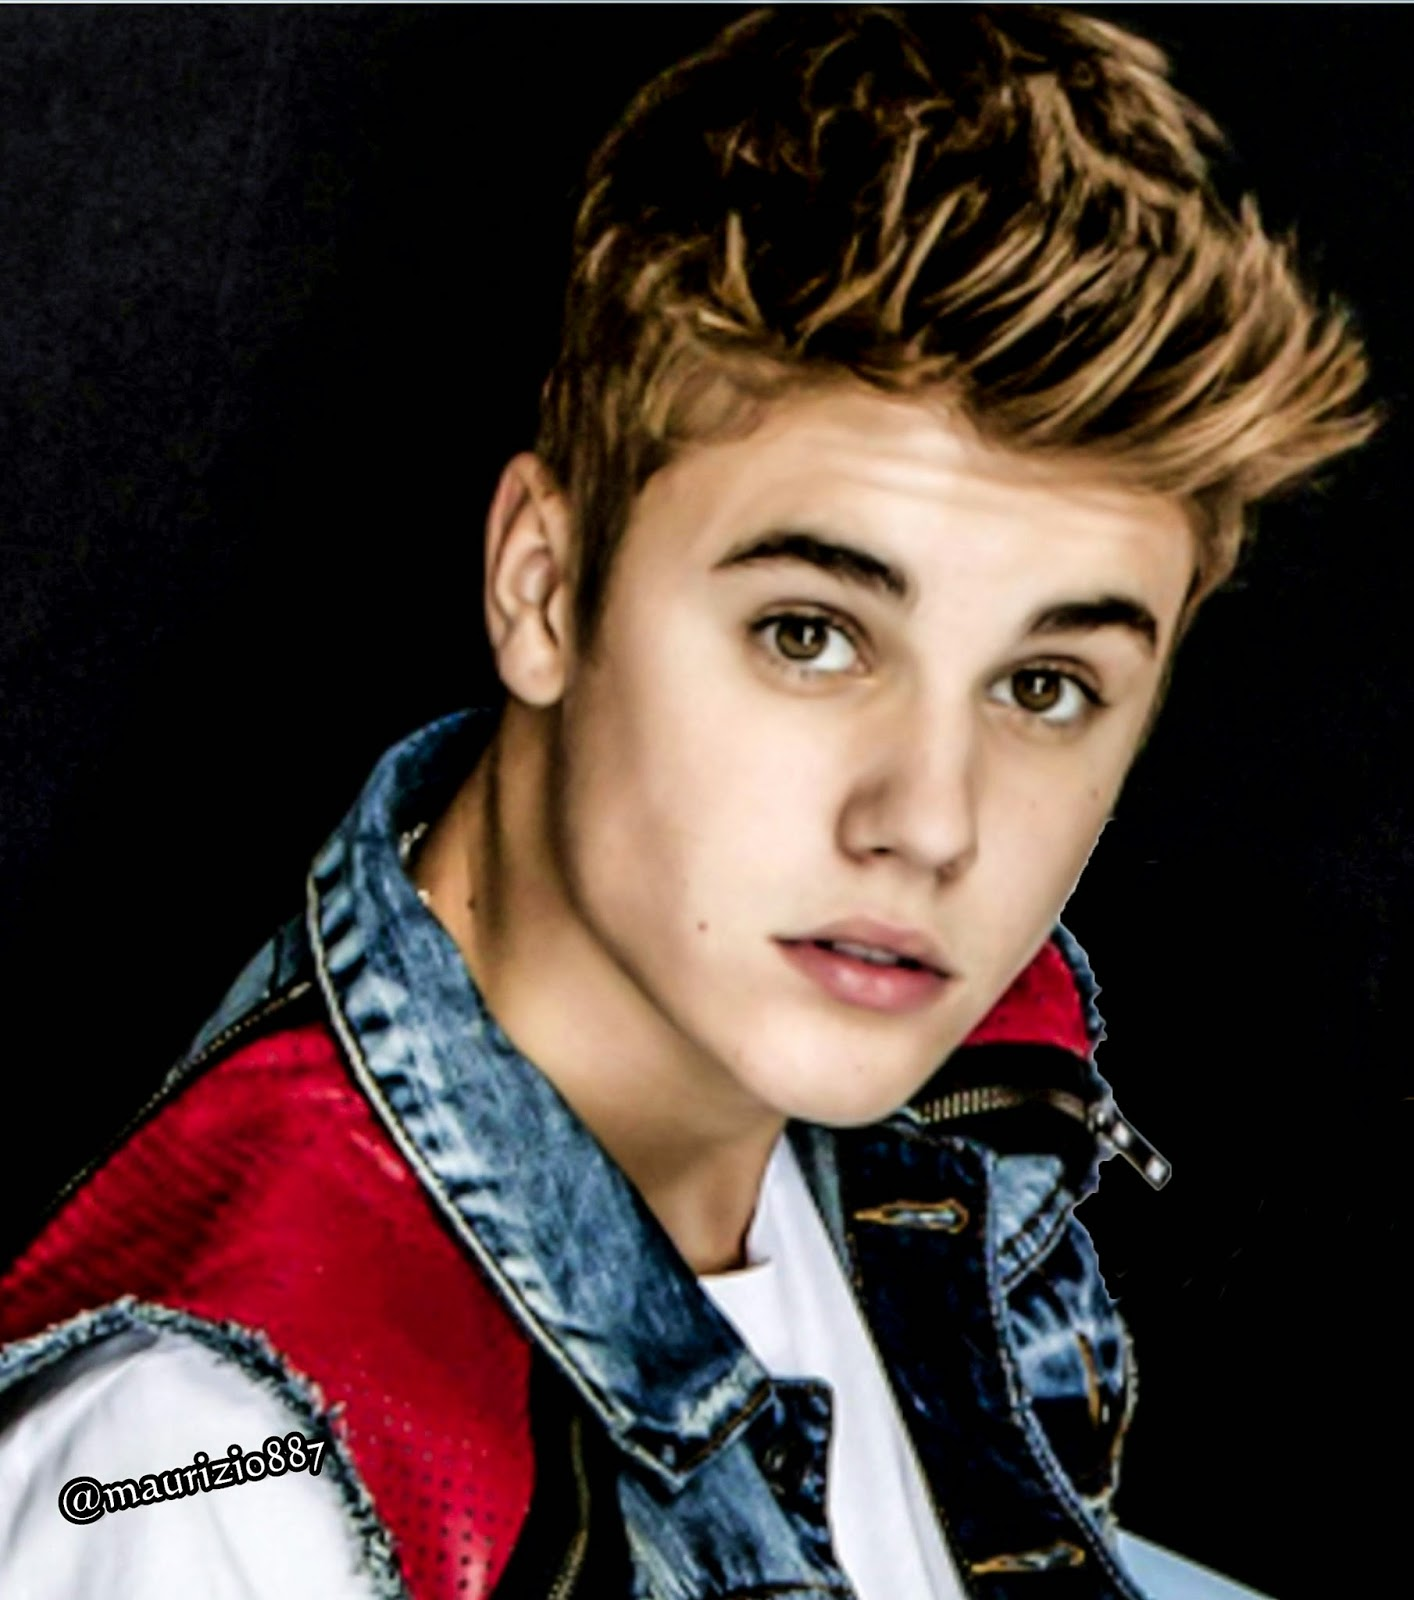 Gaya Rambut Justin Bieber 2015